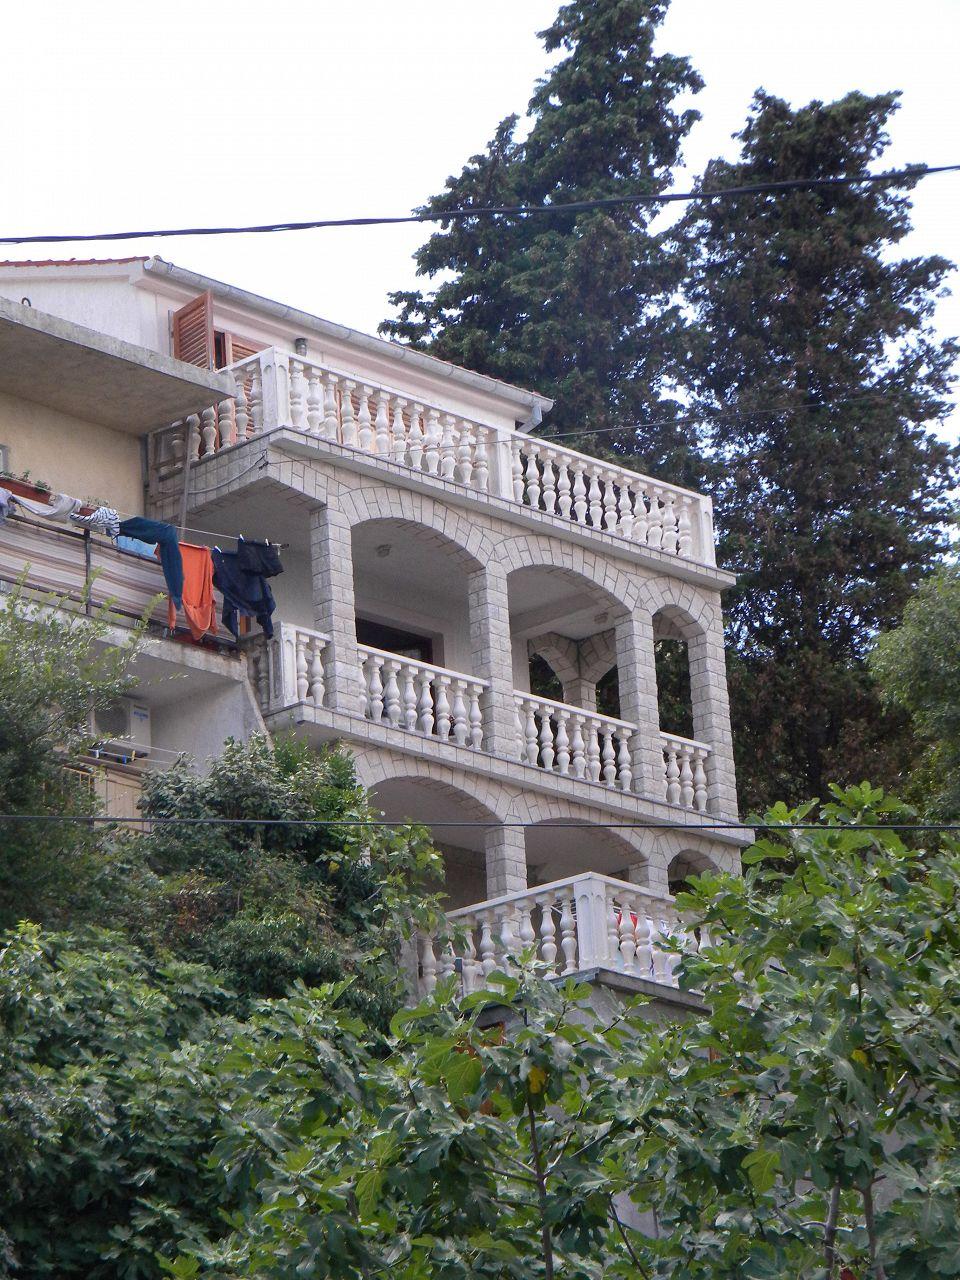 Appartement de vacances BT A2(4) - Merag (769321), Merag, Île de Cres, Kvarner, Croatie, image 4